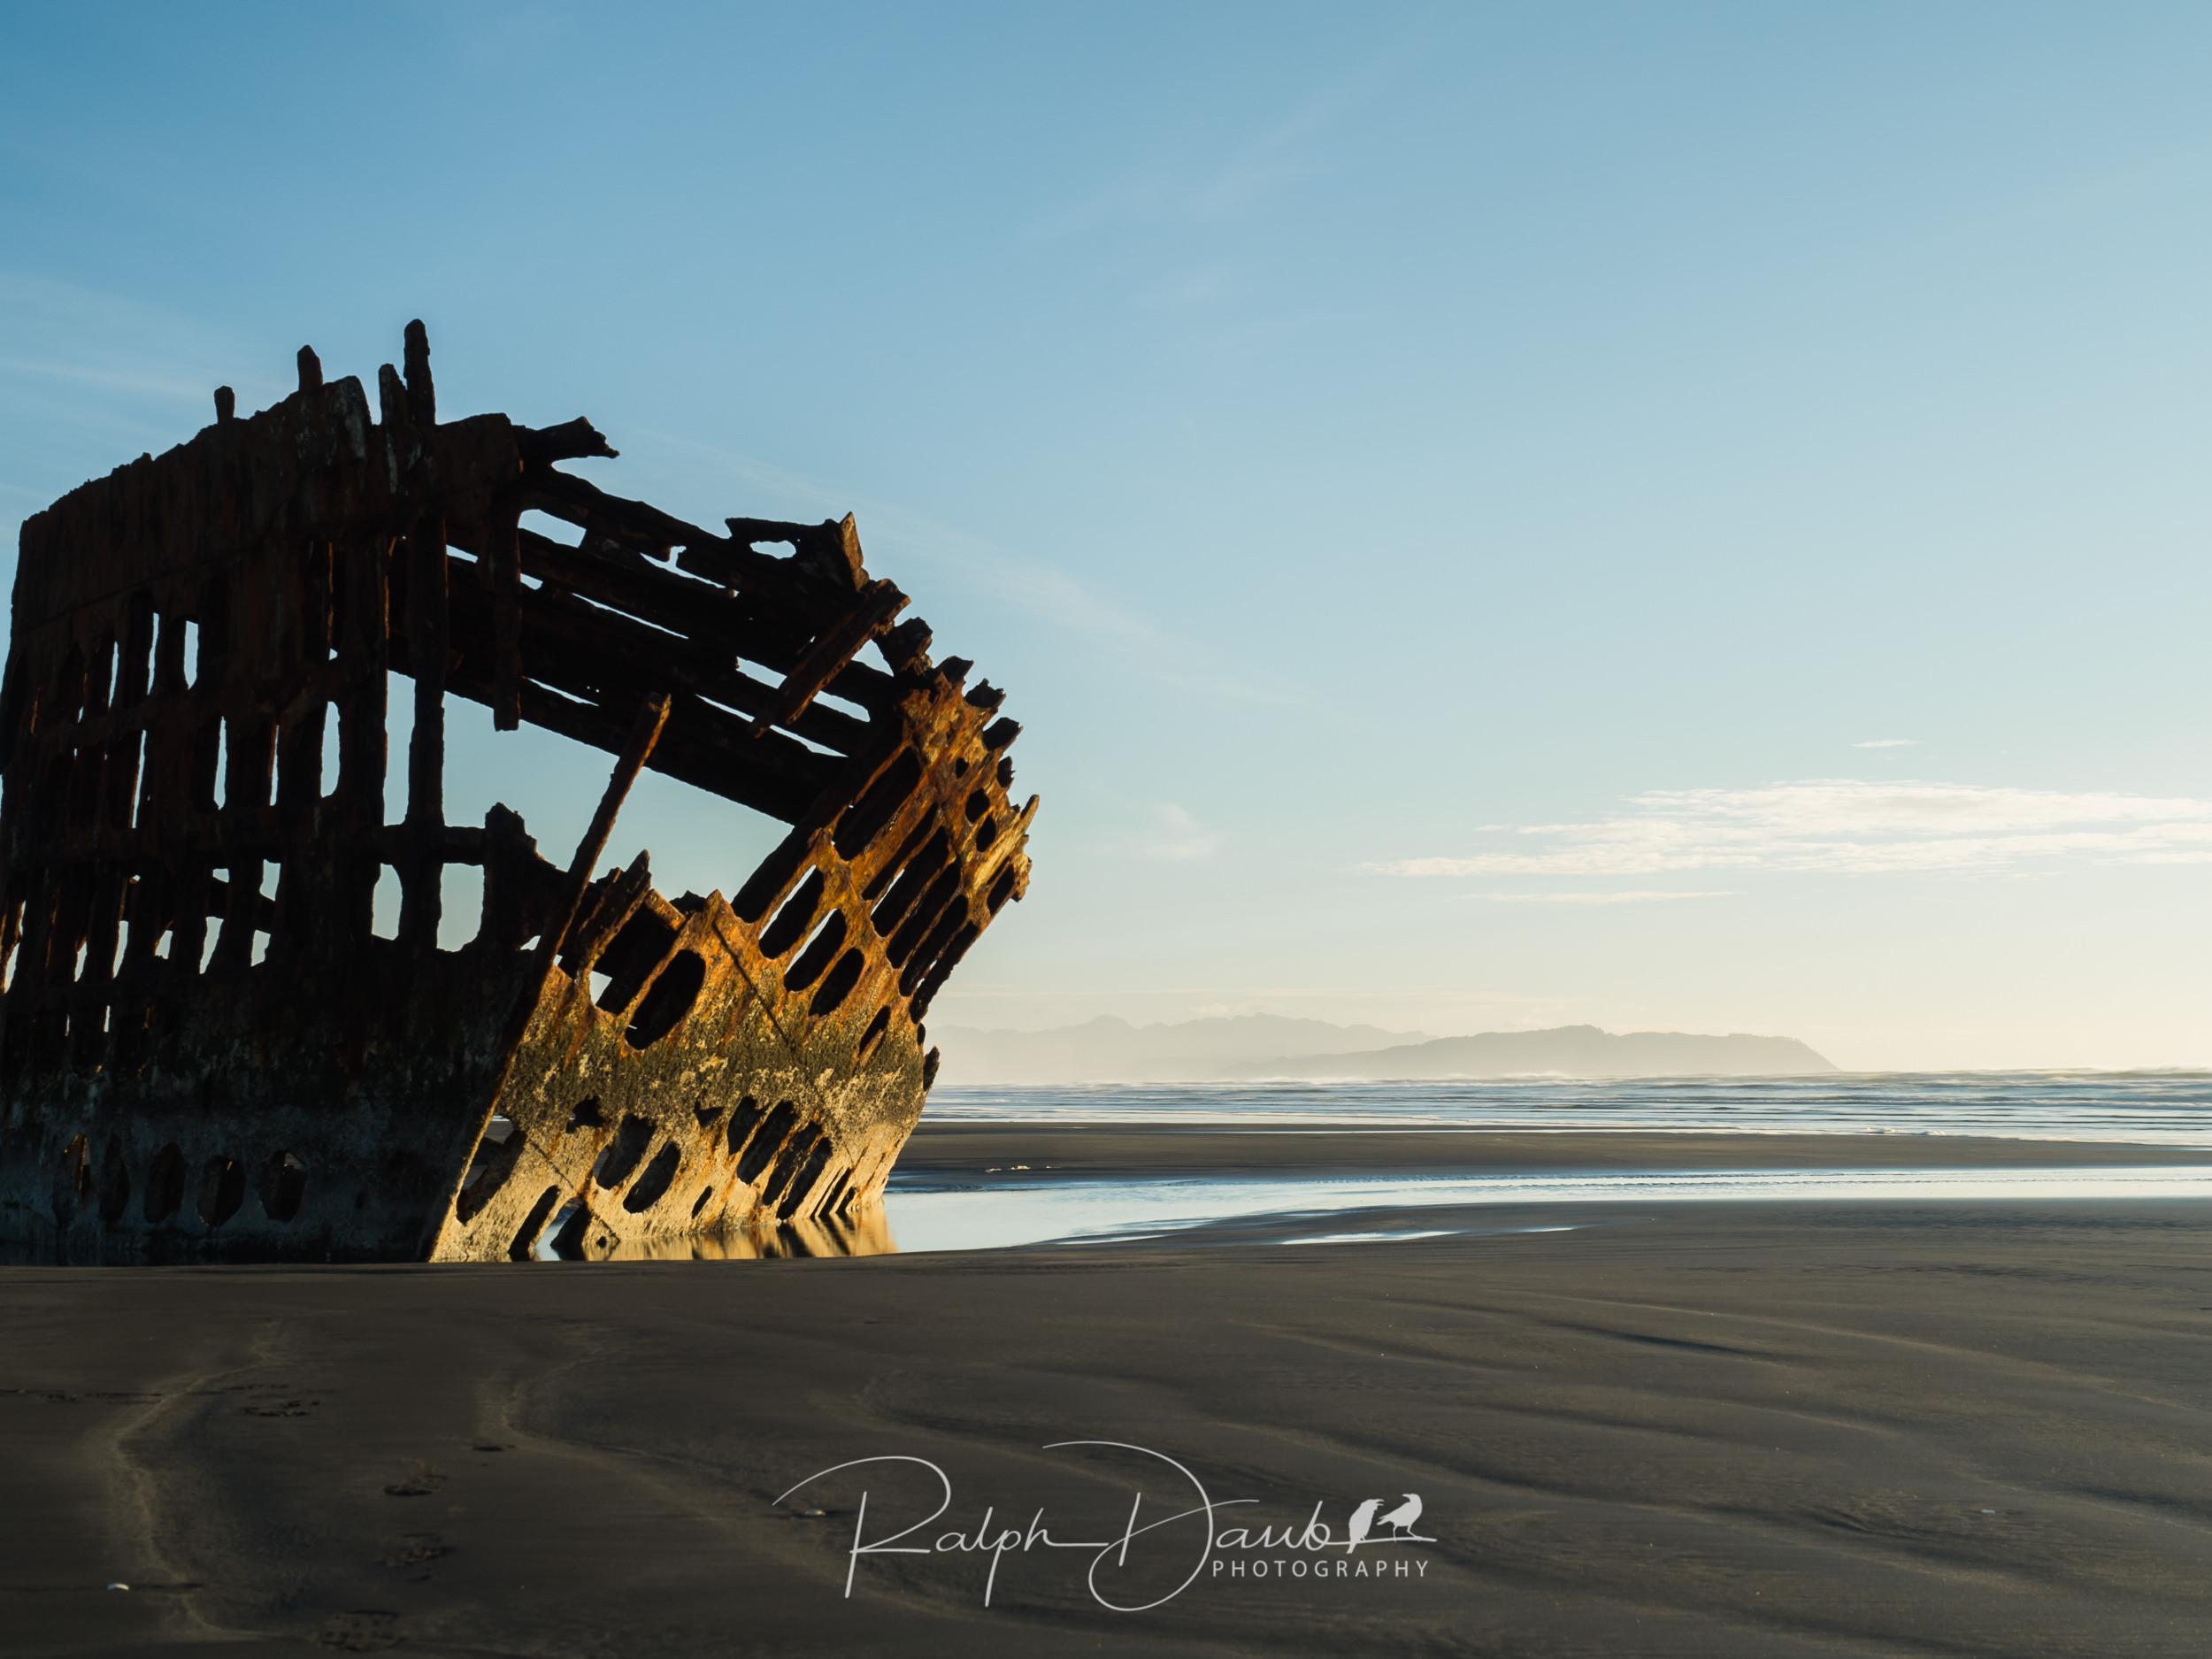 2017-12-04 - Peter Iredale Shipwreck - 16h37m.jpg